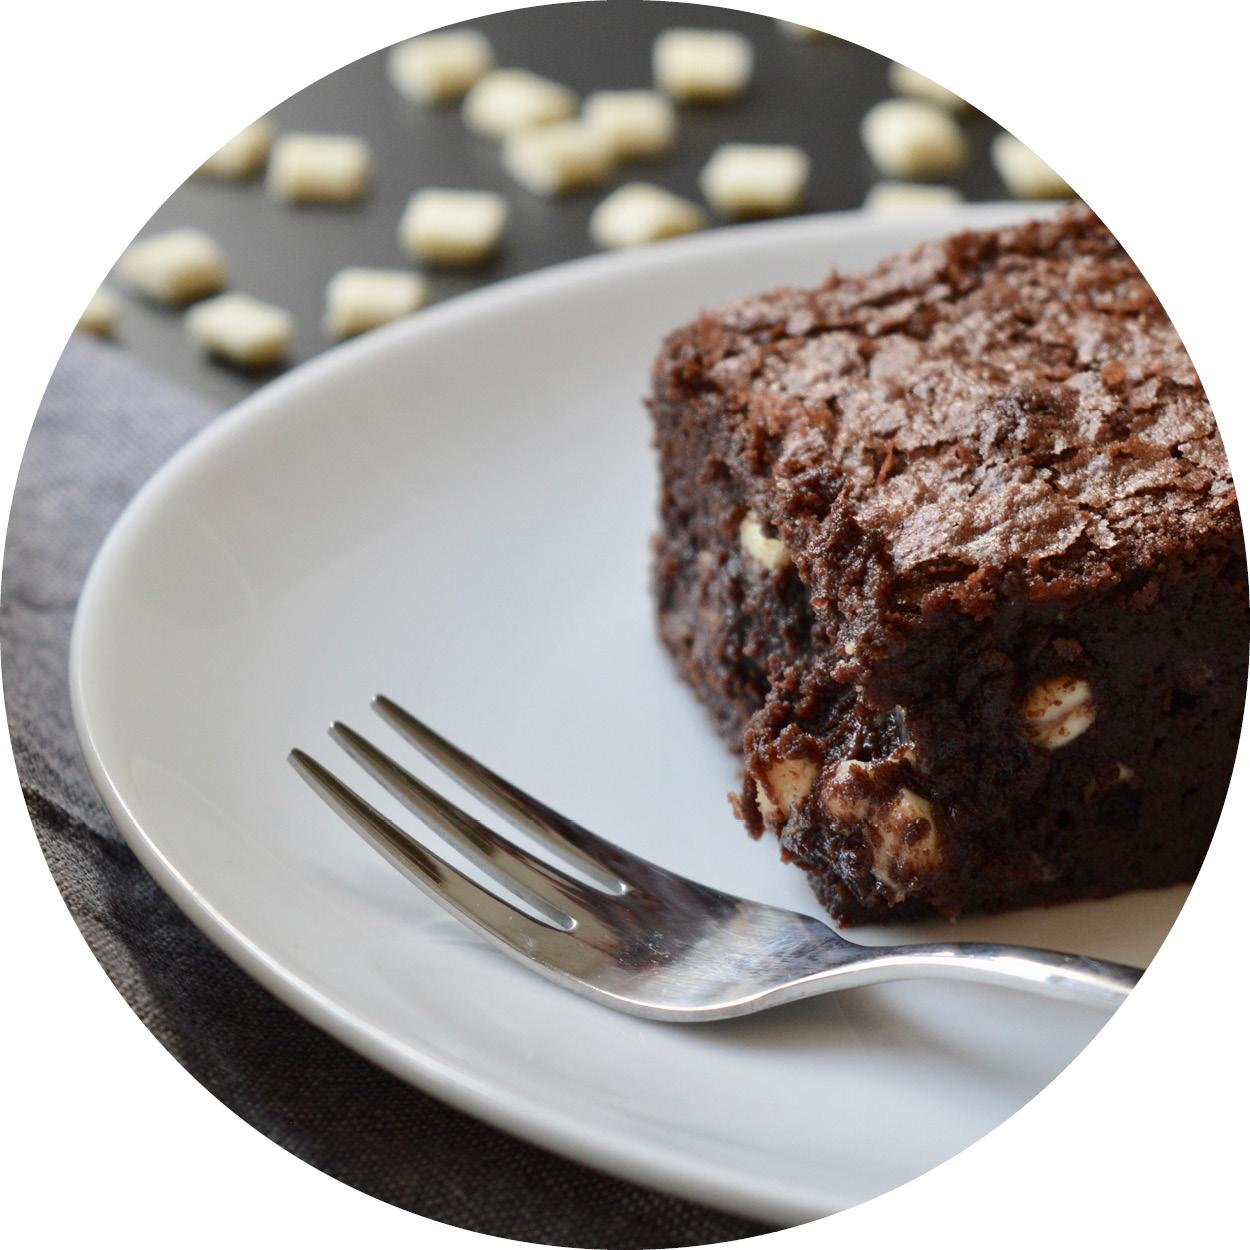 Recipe: Fool proof chocolate brownies